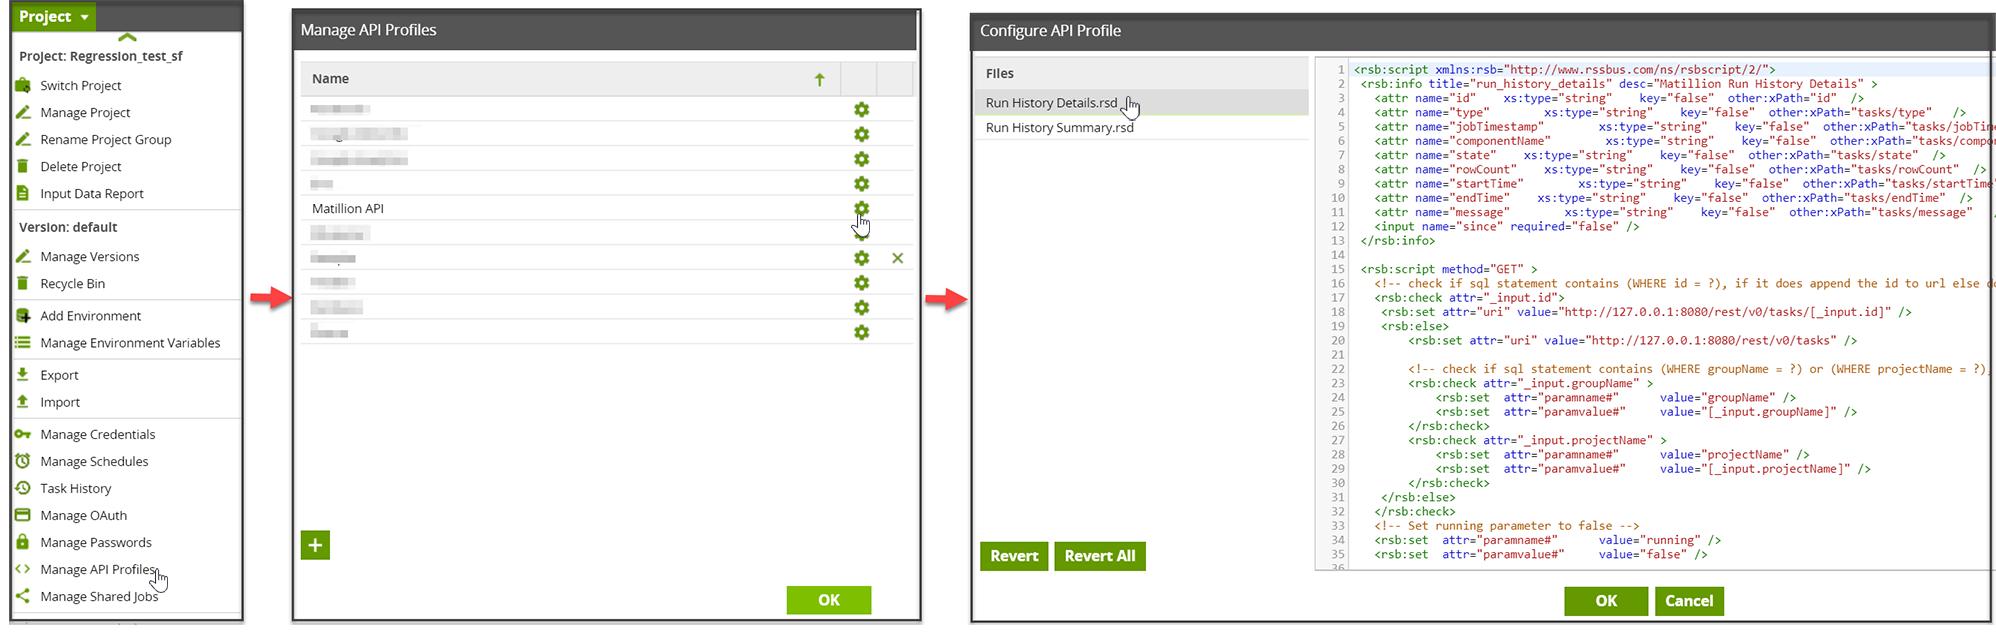 Project-ManageAPI-Configure API